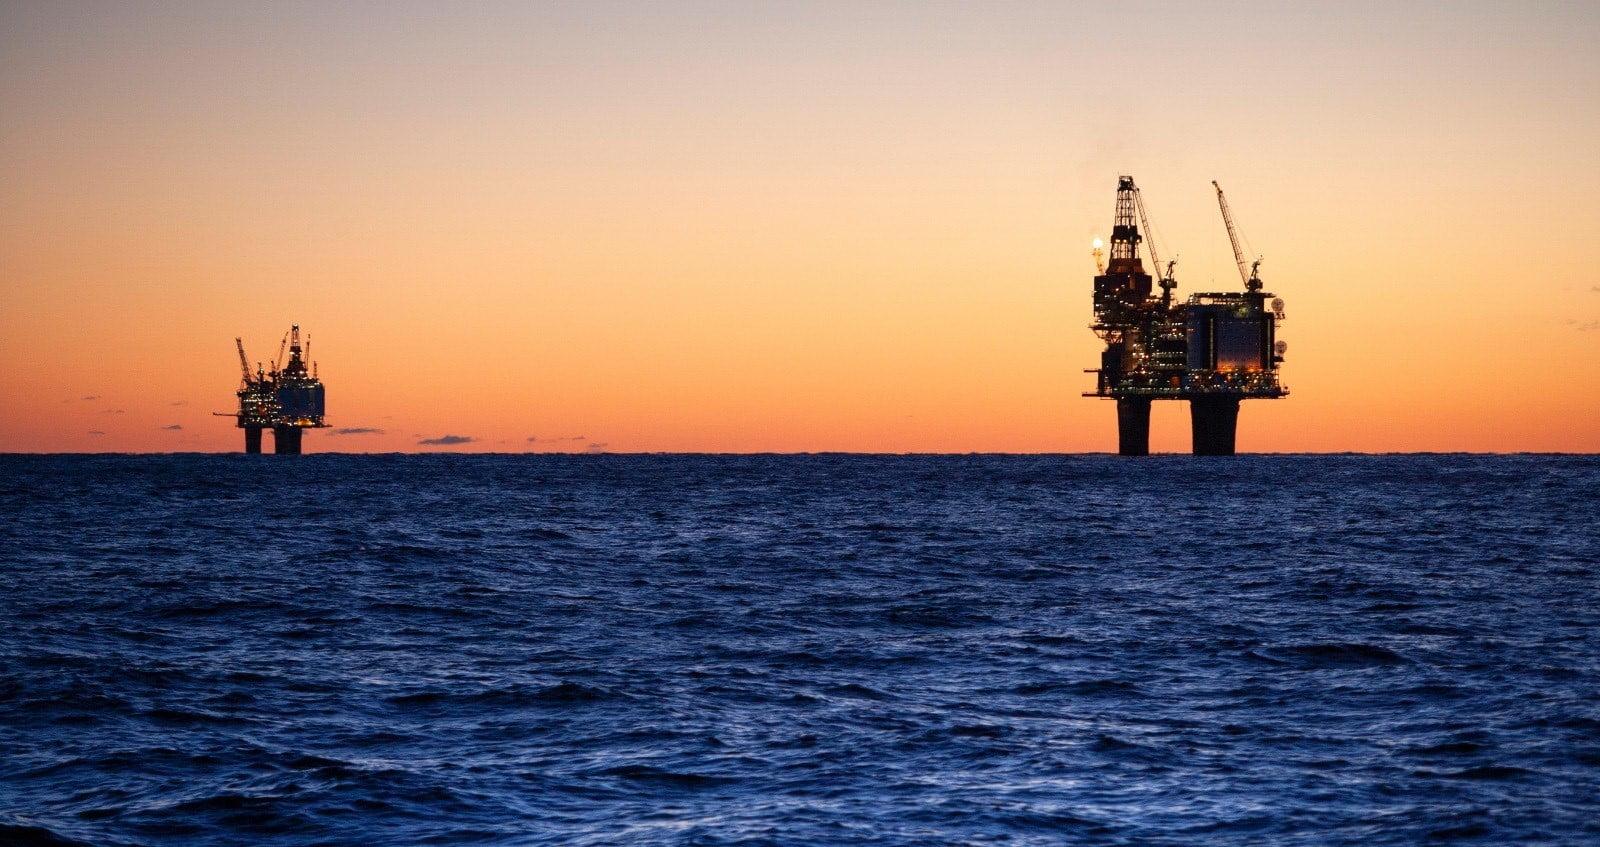 Norway oil rigs in the Norwegian Sea